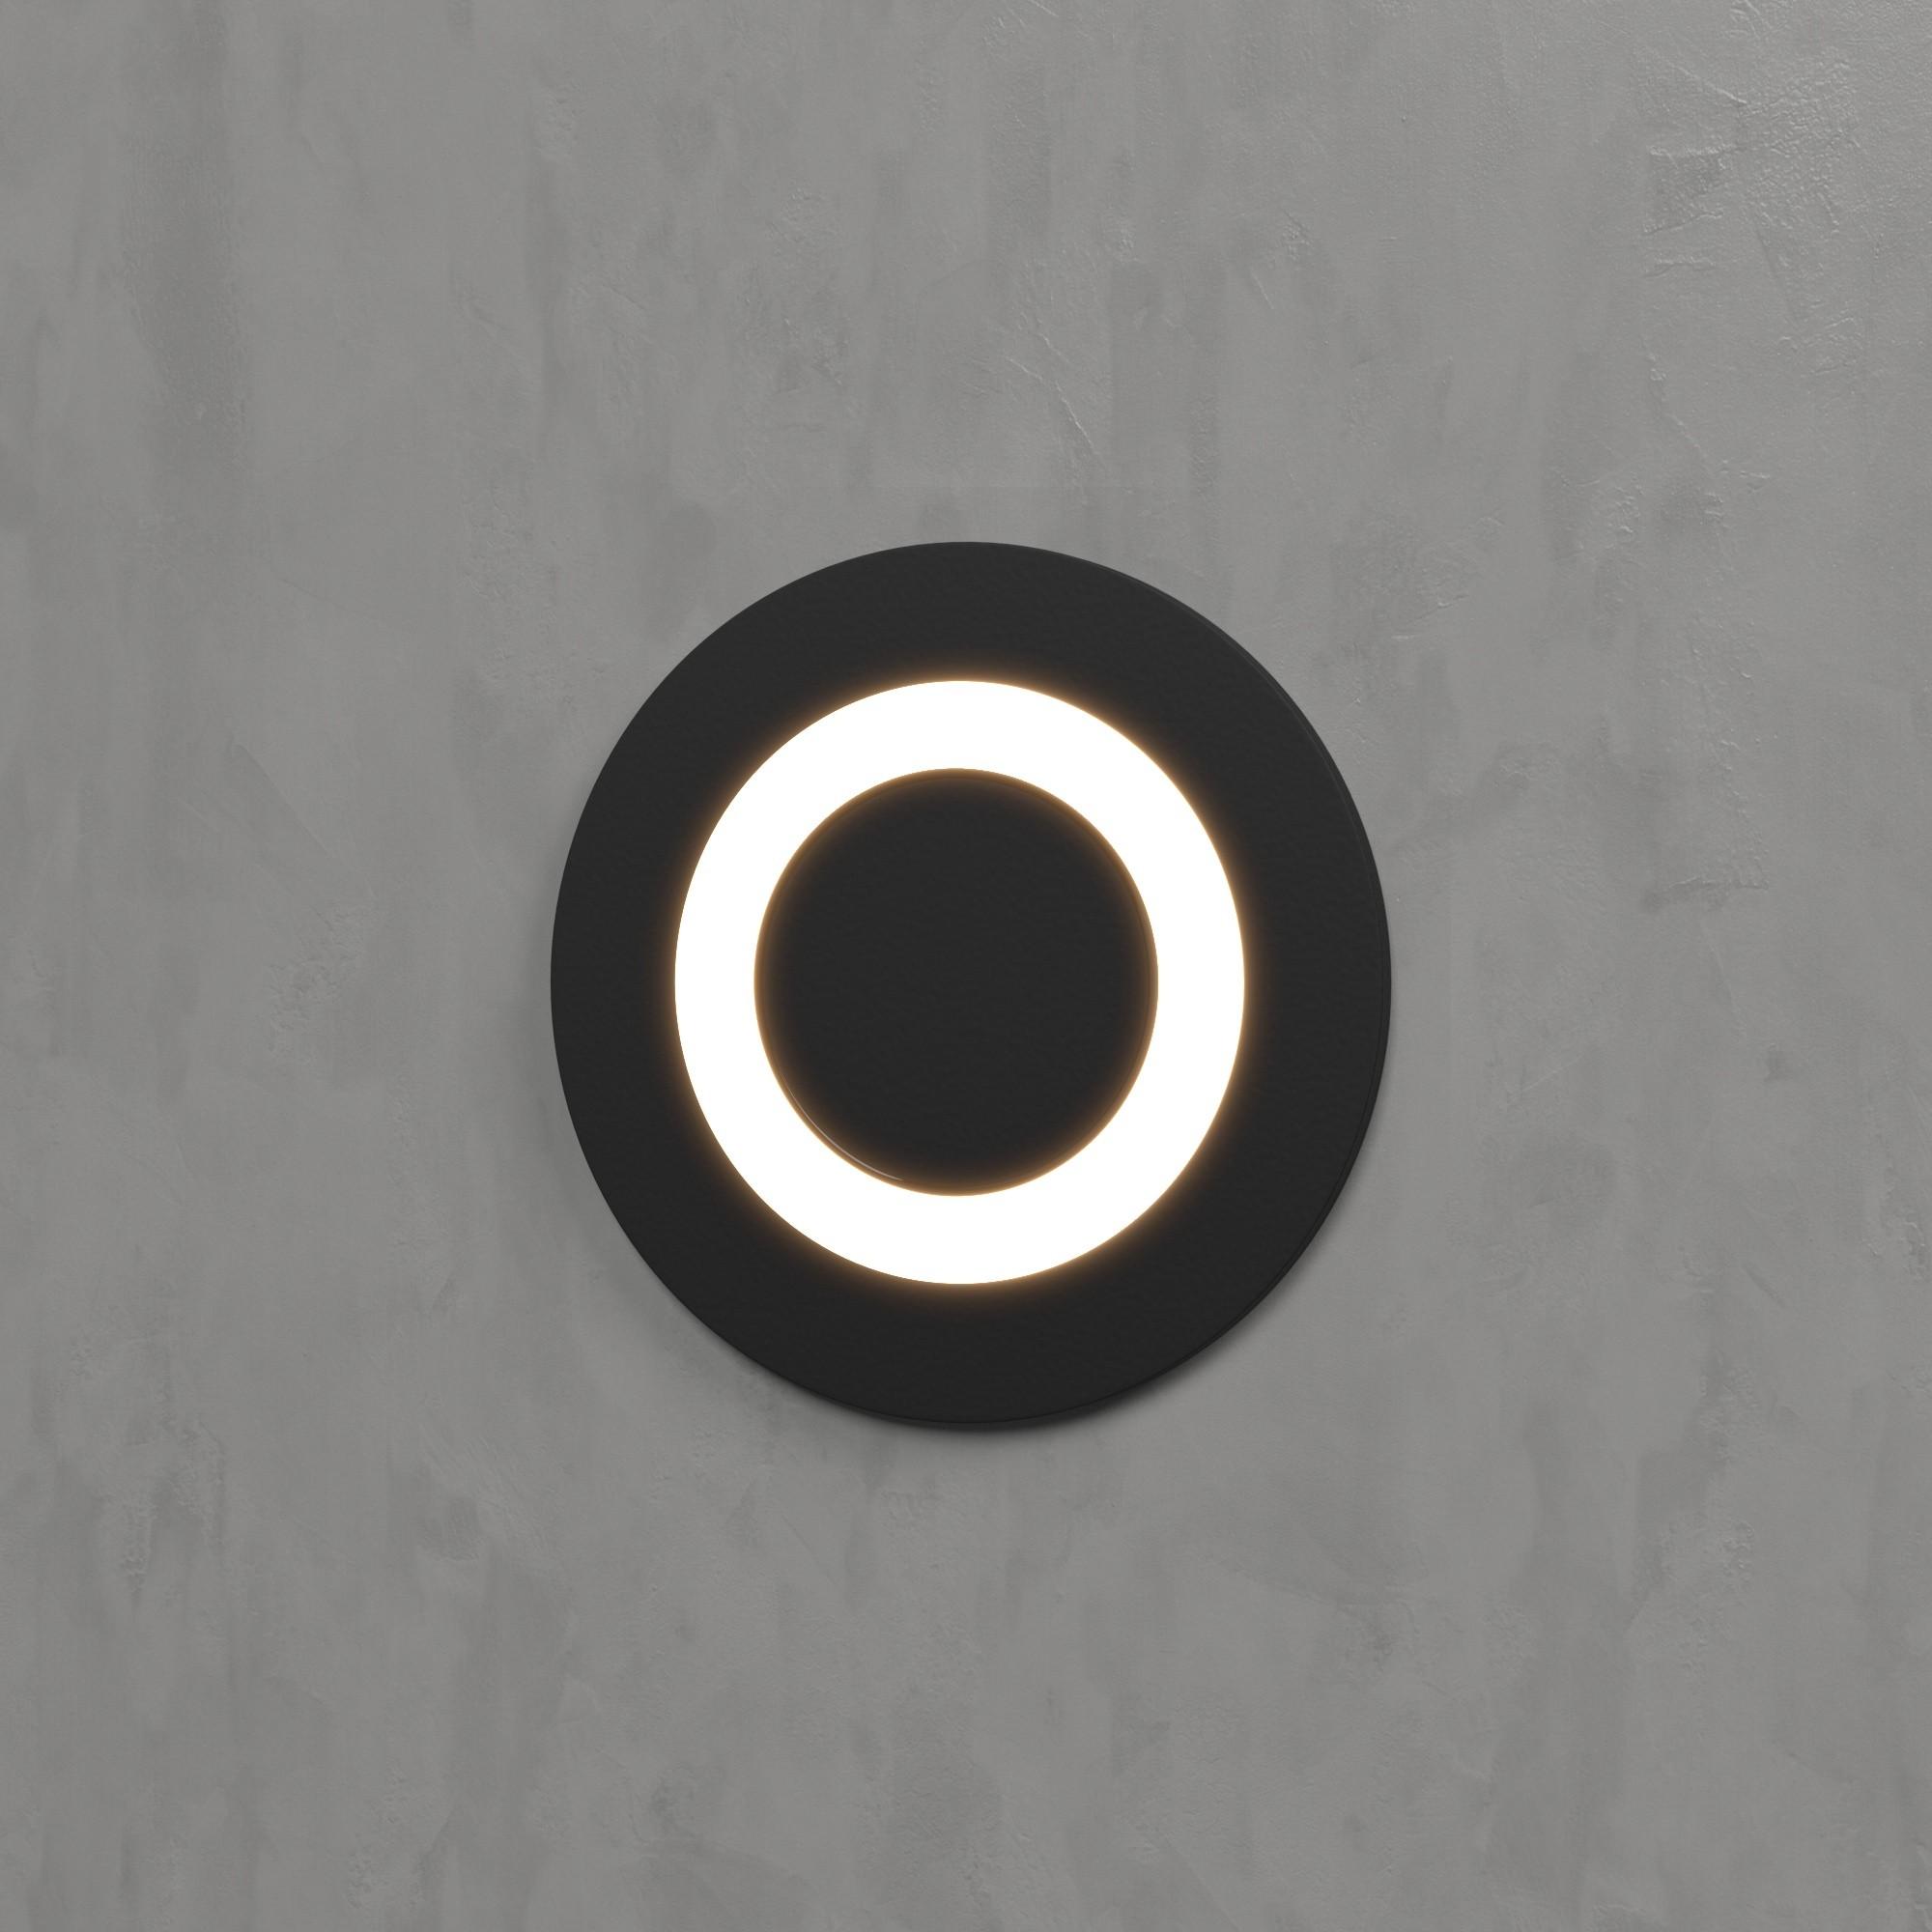 MRL LED 1107 Чёрный